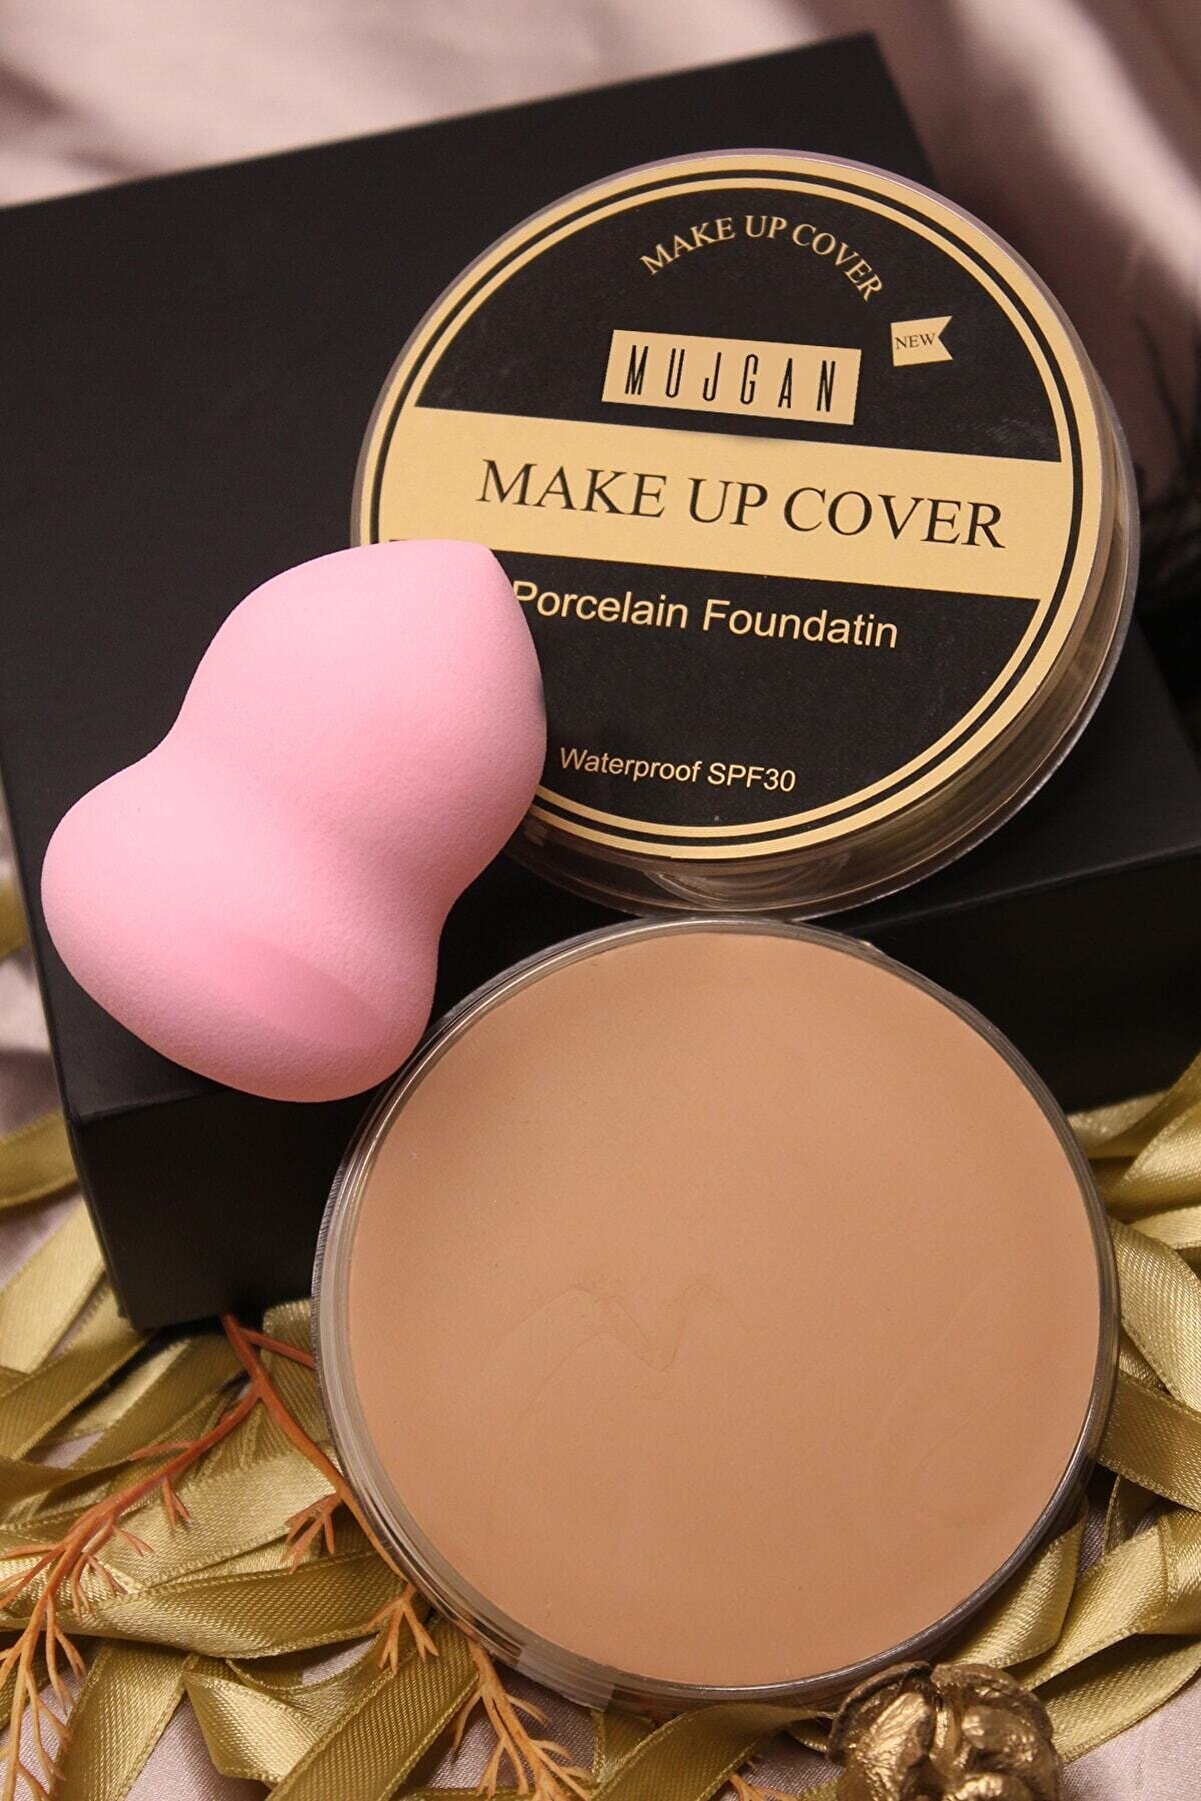 MUJGAN Makeup Cover Kapatıcı 210 (BUĞDAY TEN) Tekli Armut Sünger